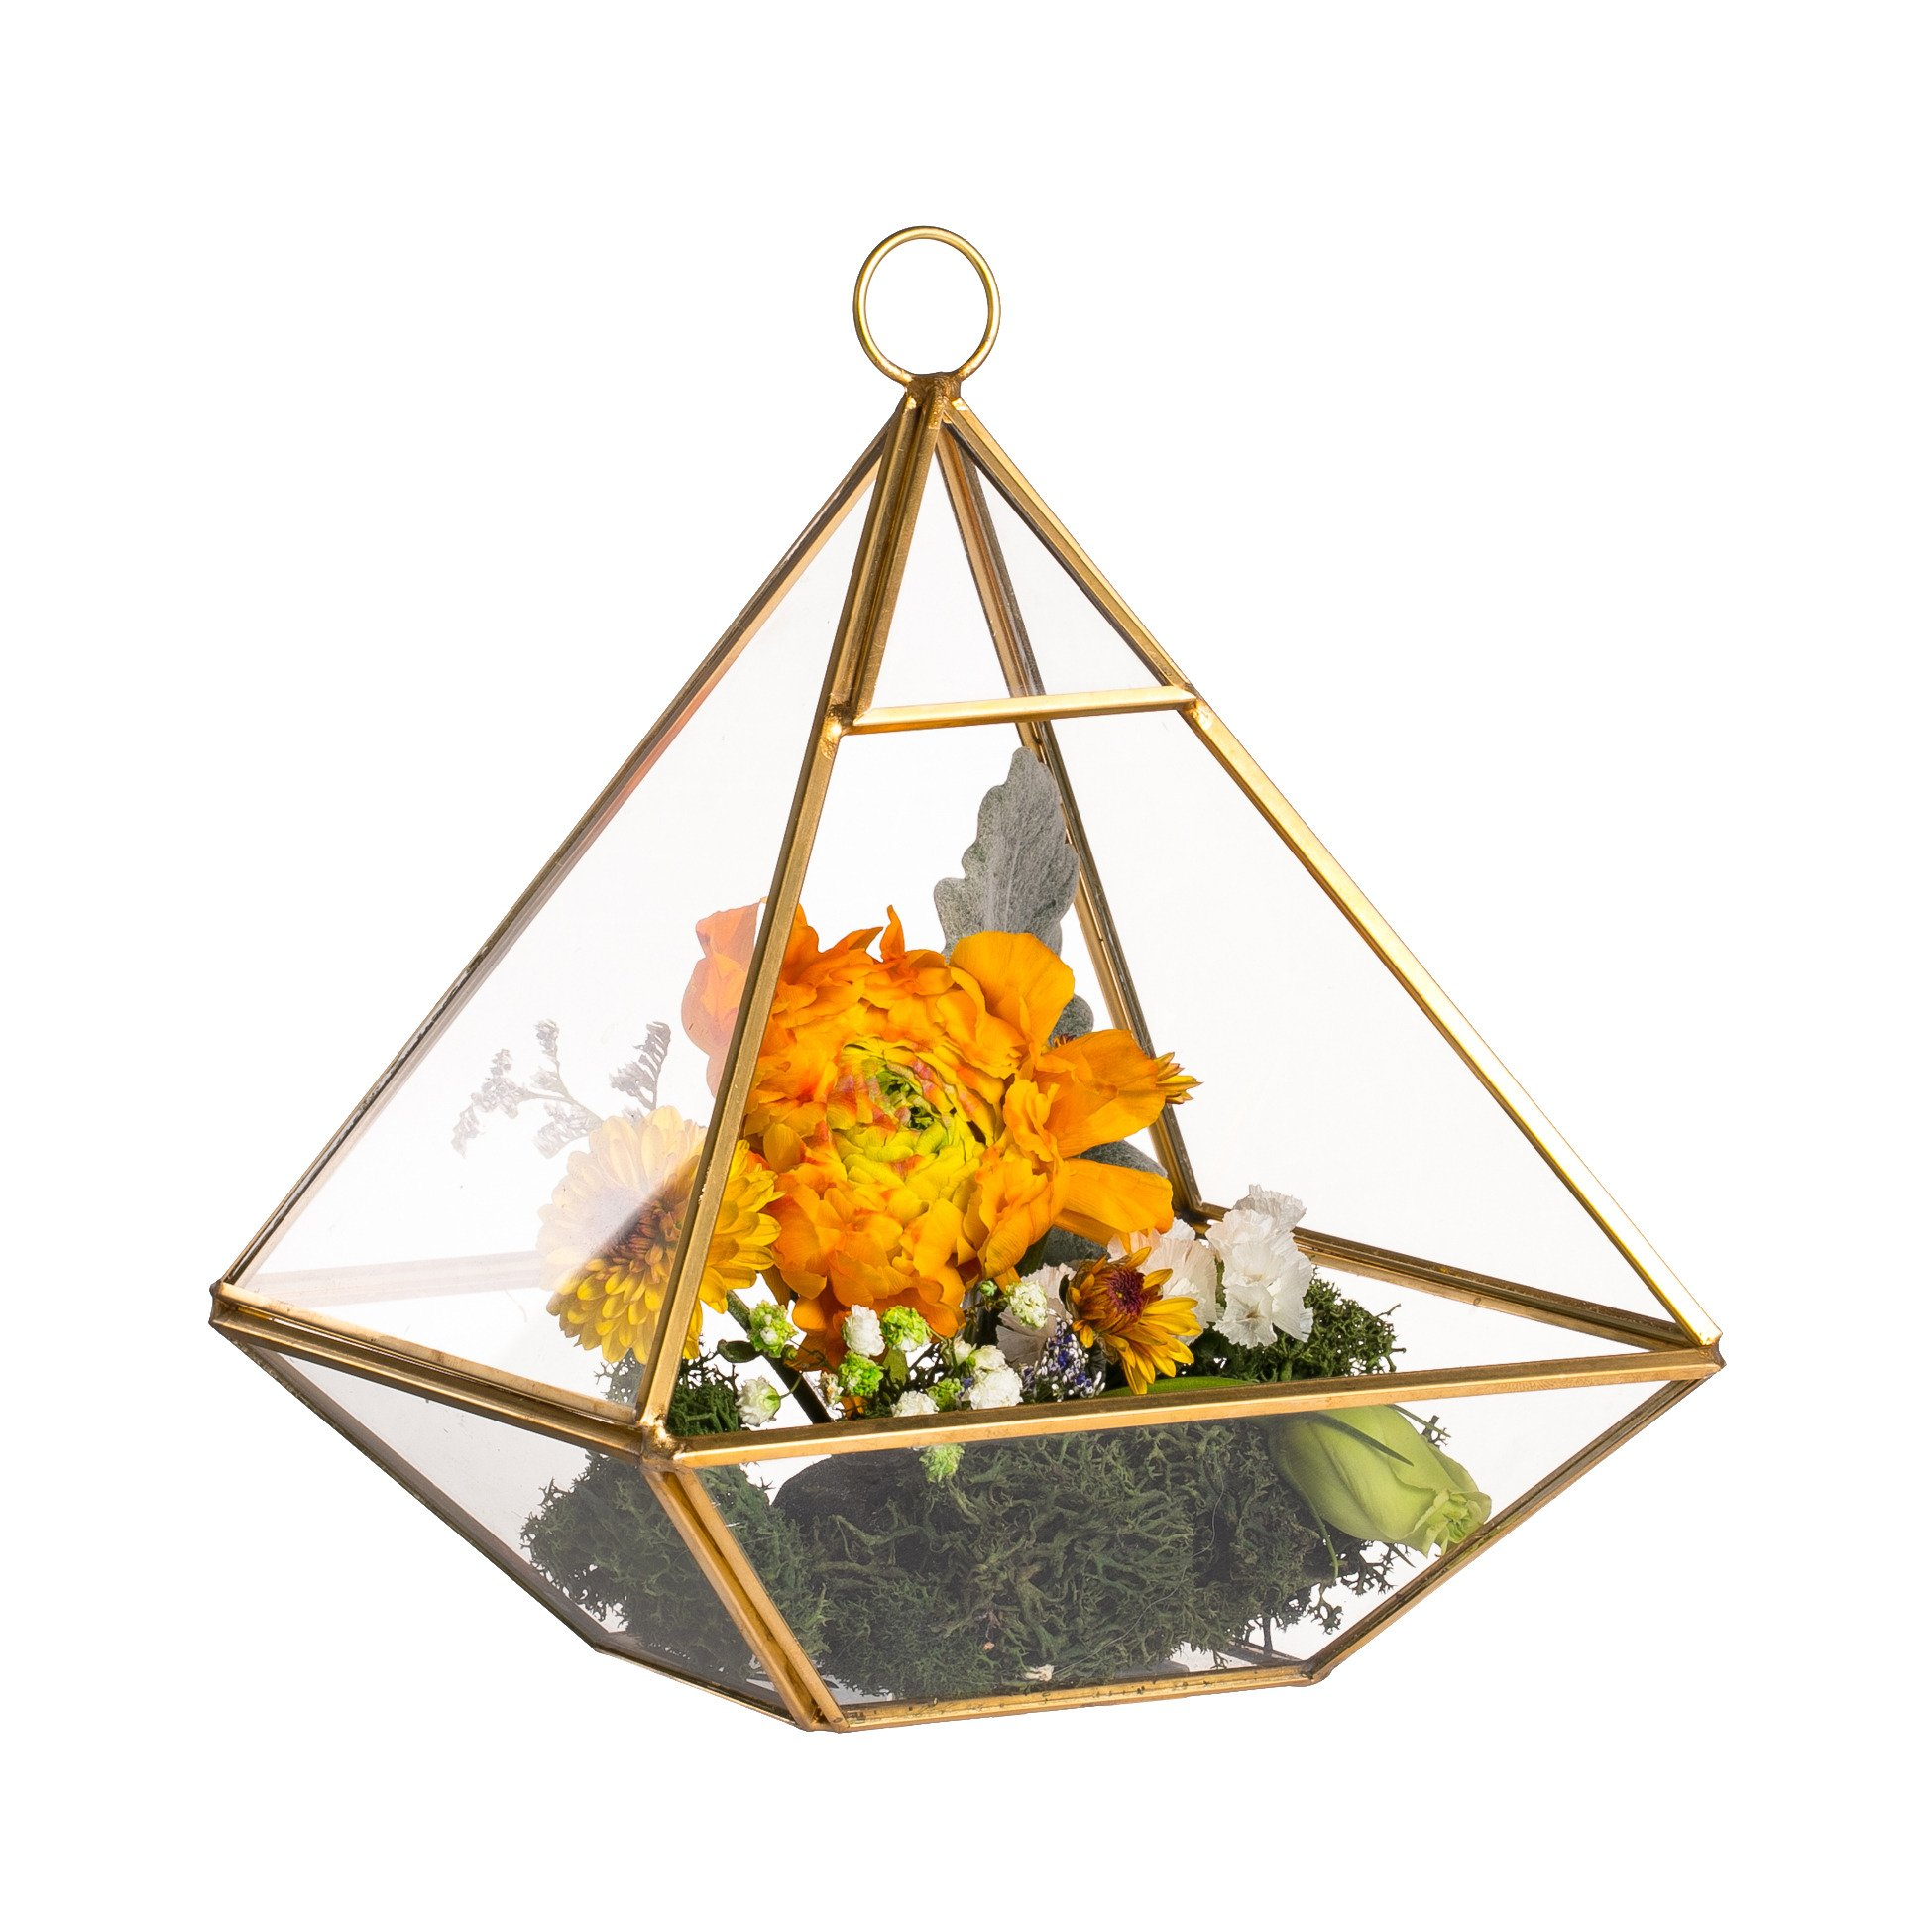 NCYP Brass Hanging Copper Gold Pyramid Geometric Glass Terrarium Centerpiece Candle Holder Lantern Wedding Party Wall Mount Decoration Ornament